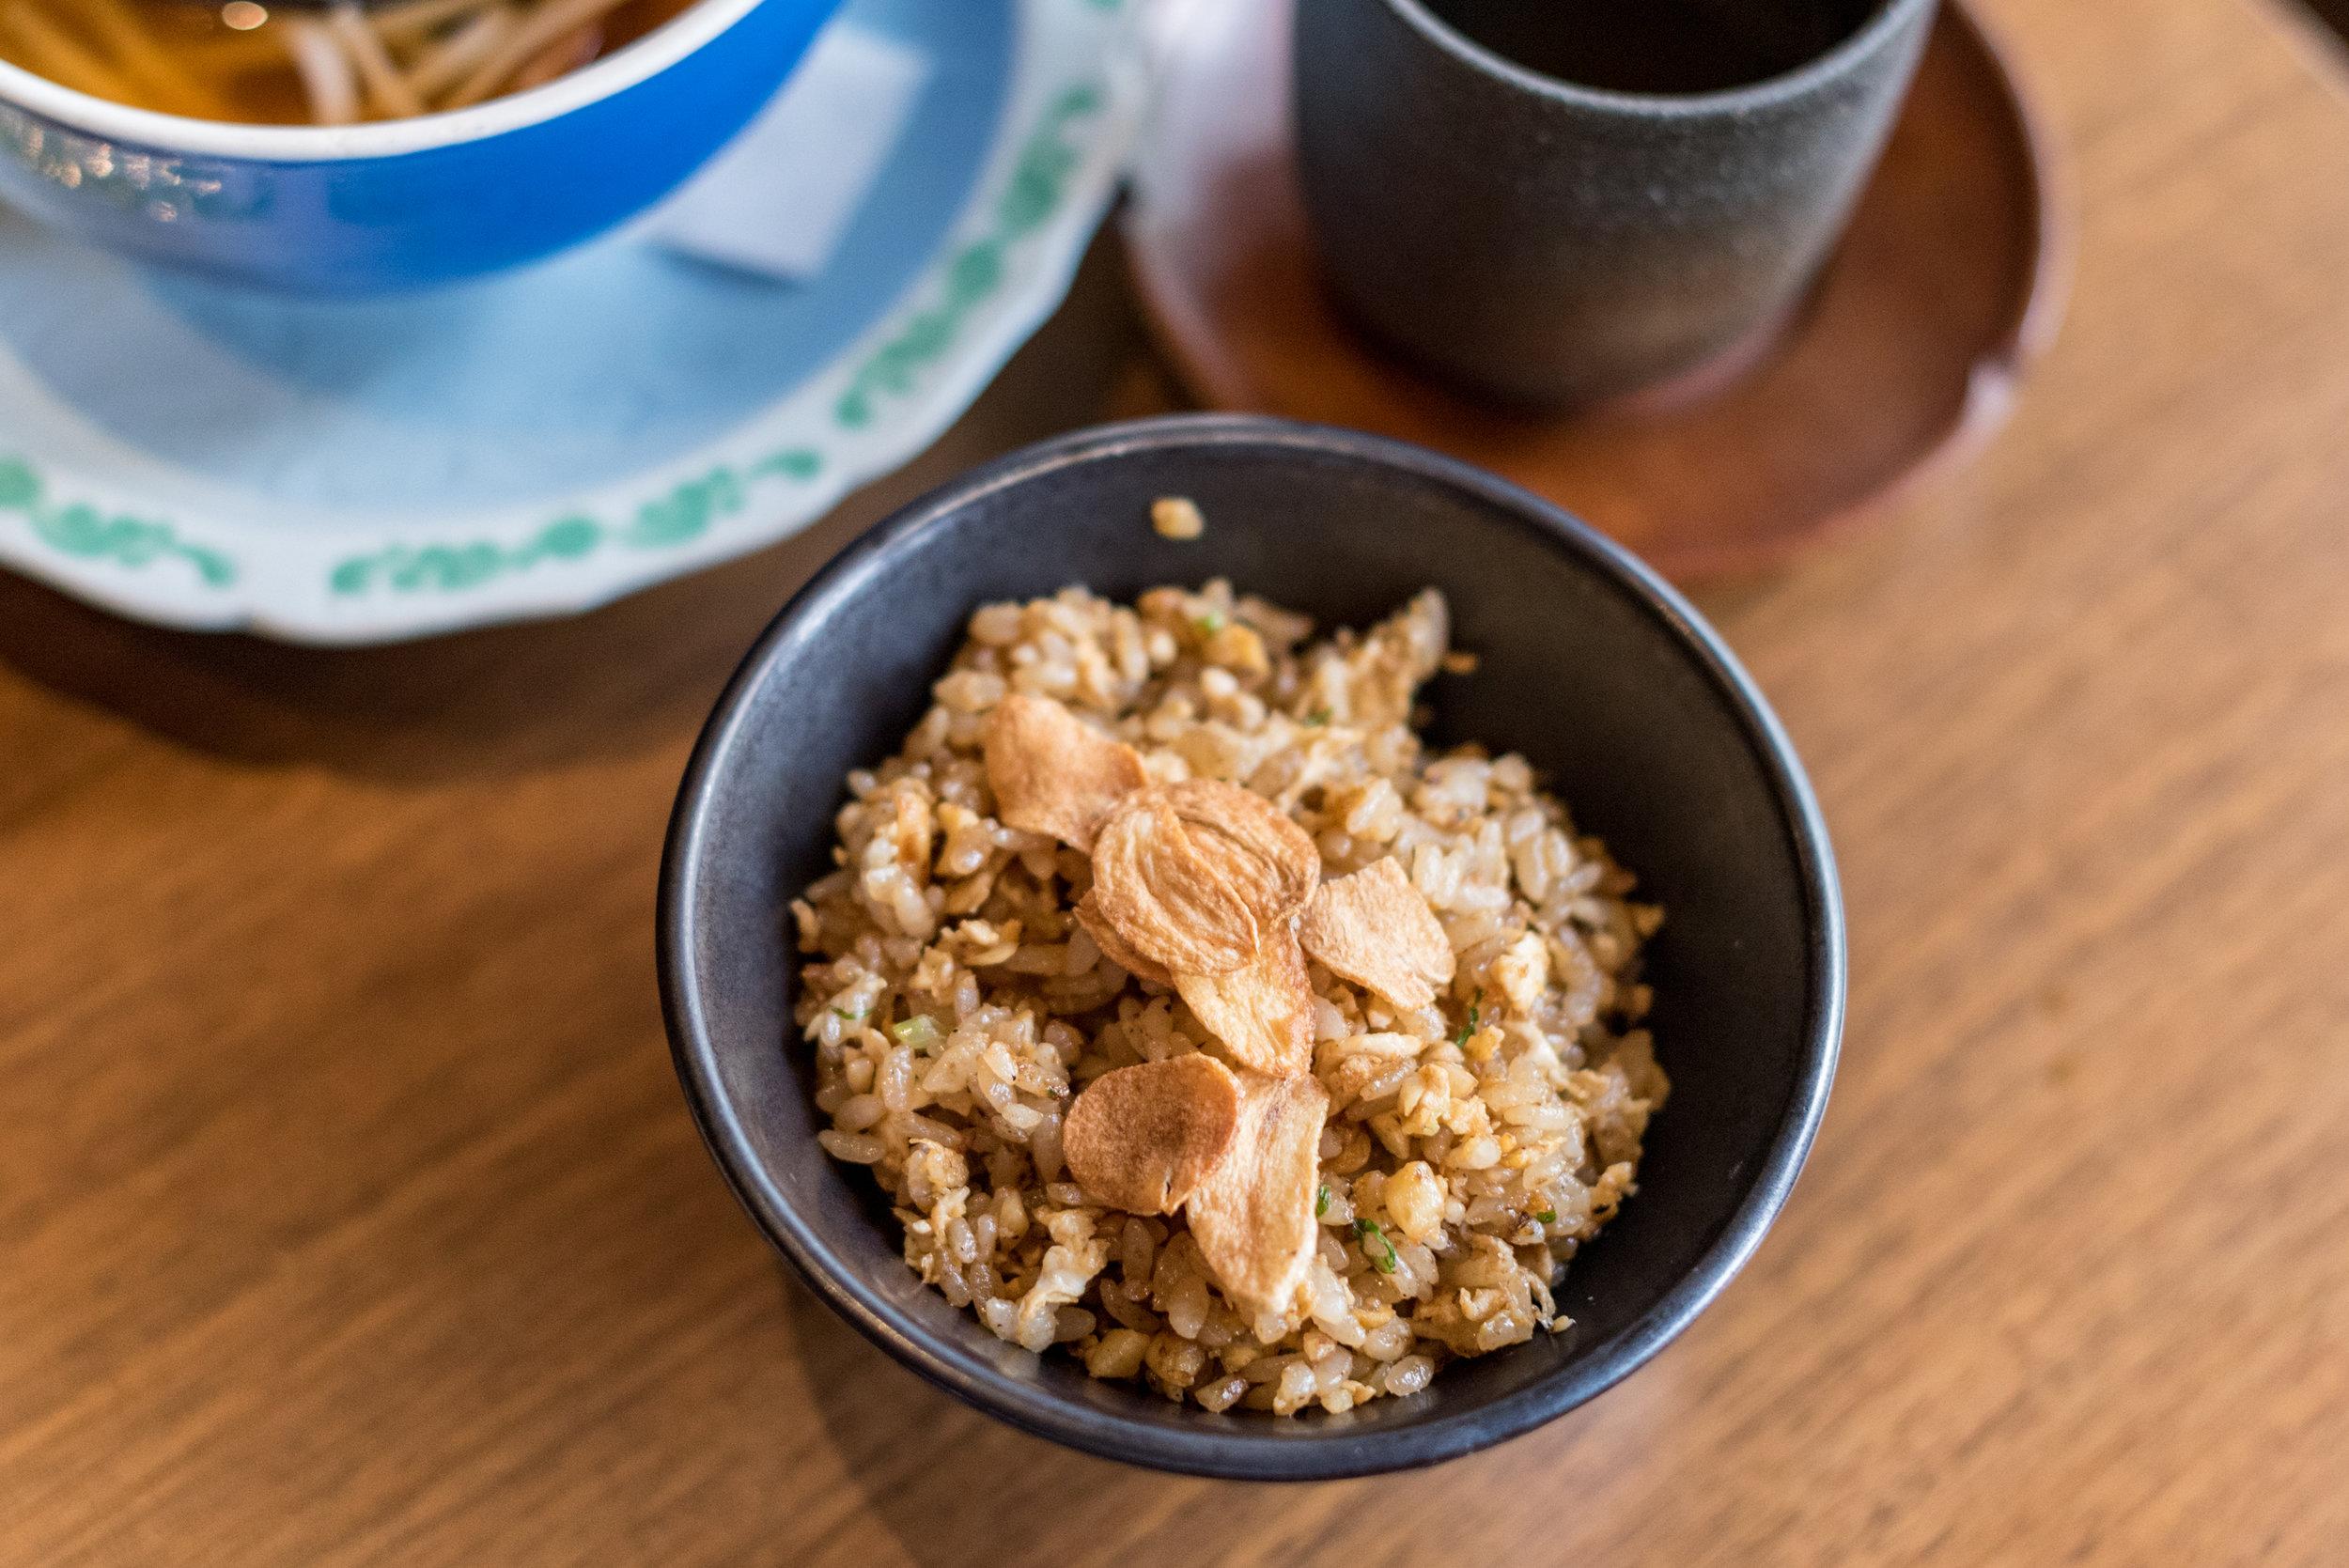 Garlic Fried Rice - Bubbly Brunch Keyaki - Pan Pacific Singapore